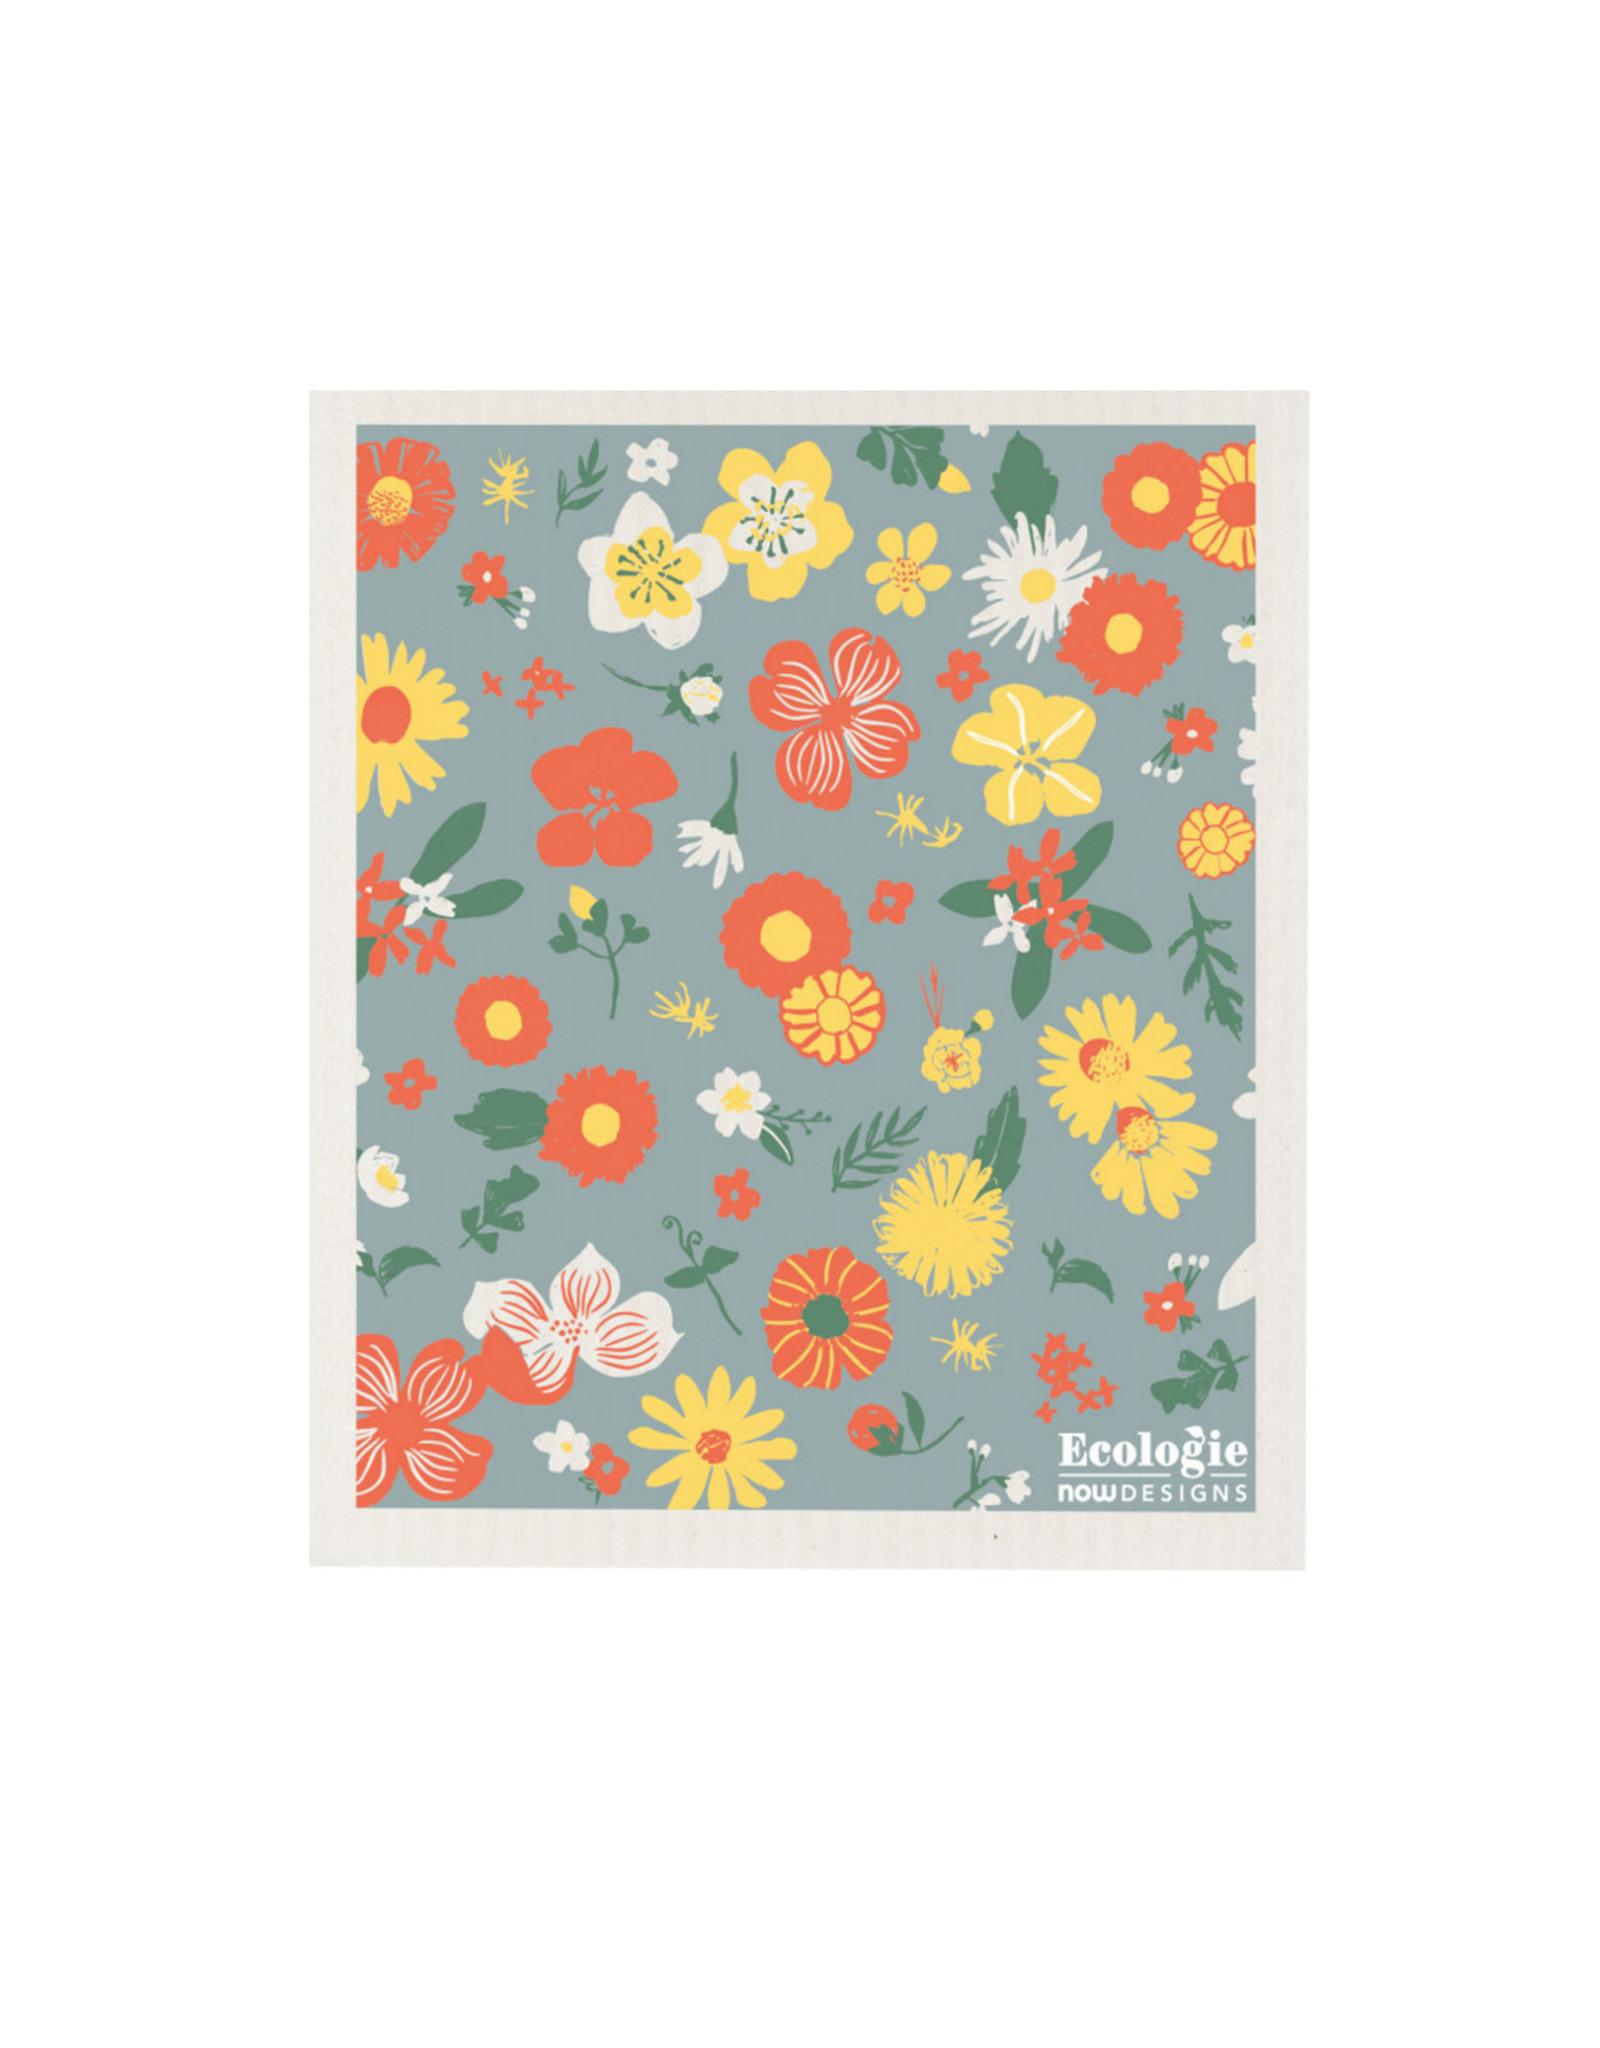 Danica Ecologie Swedish Sponge Cloths, Flowers of the Month